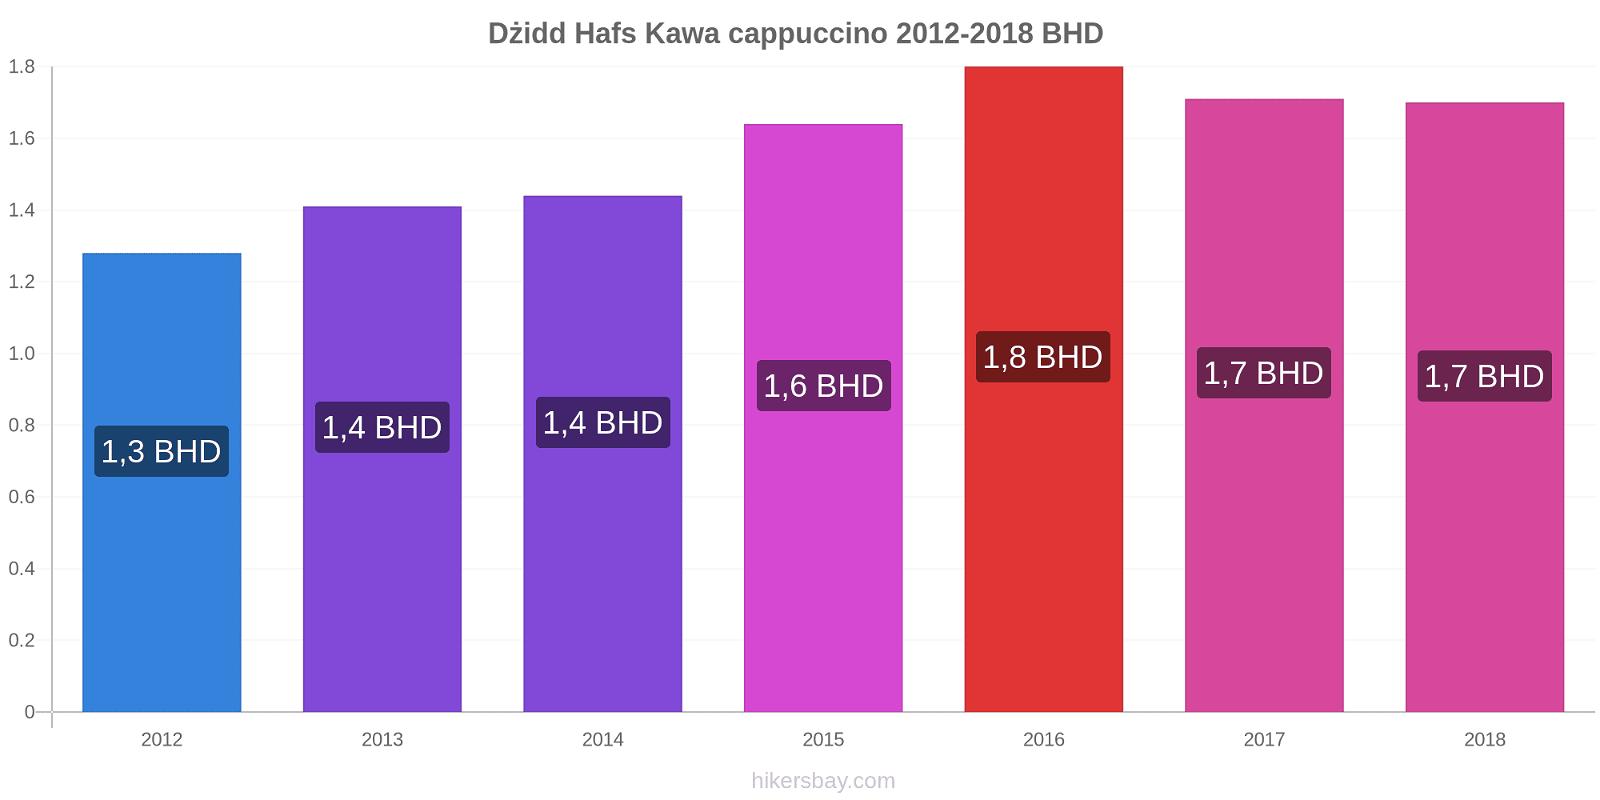 Dżidd Hafs zmiany cen Kawa cappuccino hikersbay.com